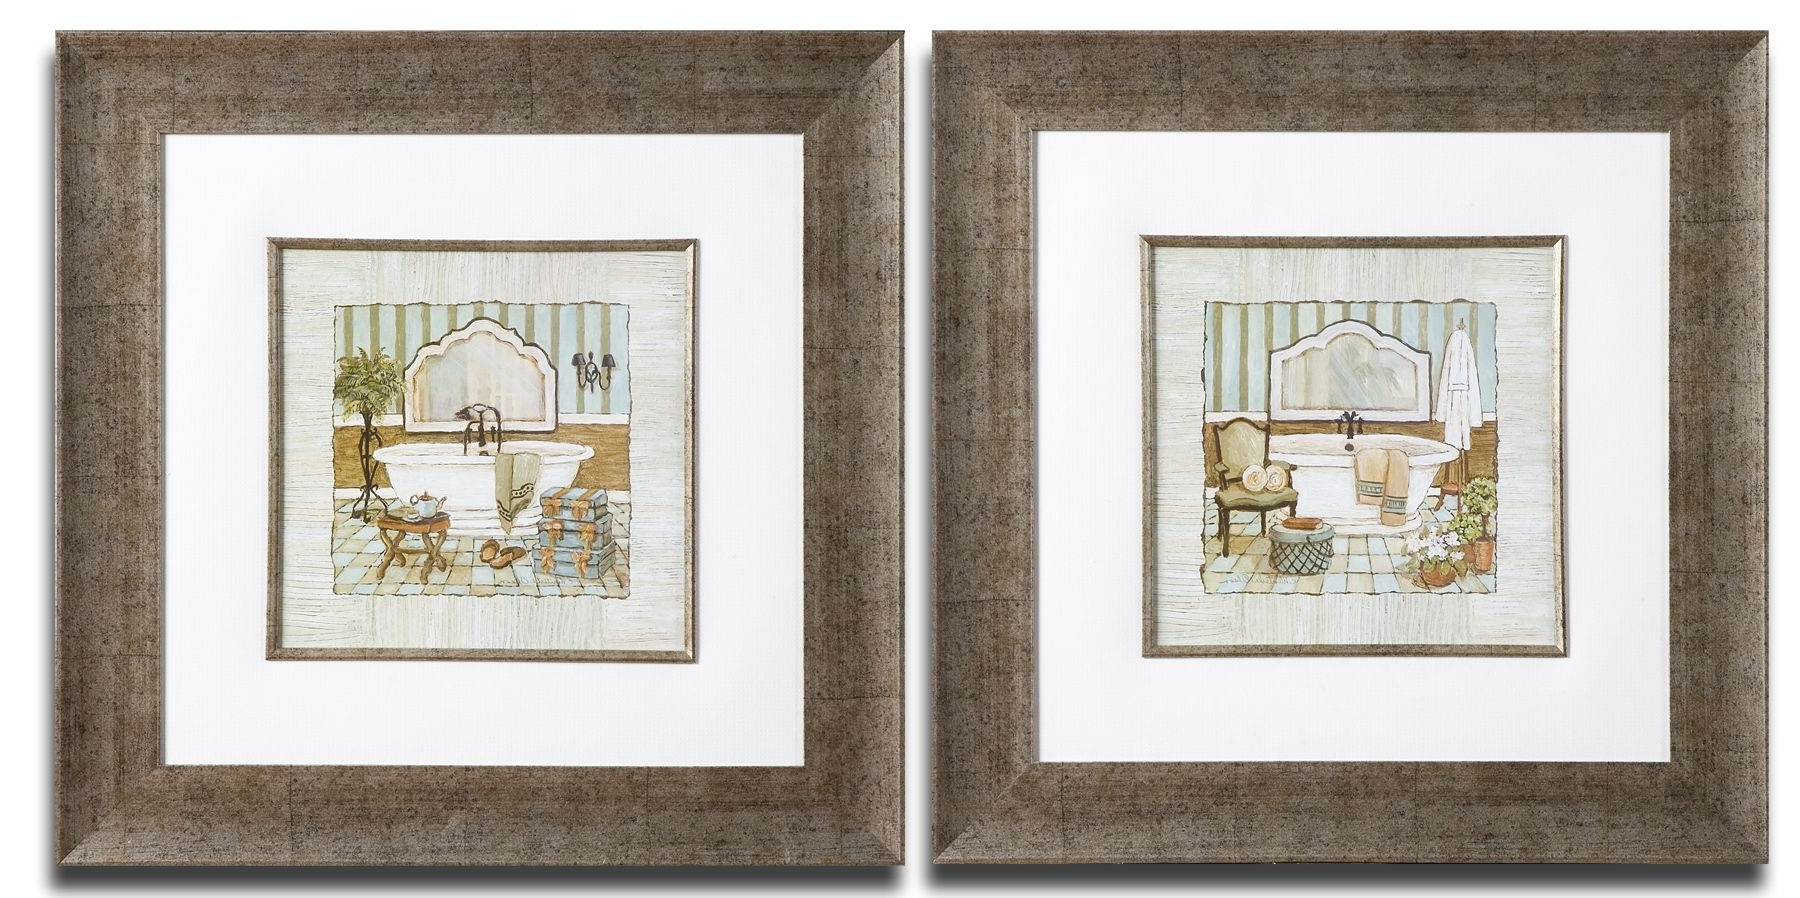 Famous Framed Art Prints Sets Throughout Framed Art For Bathroom, French Bathroom Prints Vintage Bathroom (View 4 of 15)